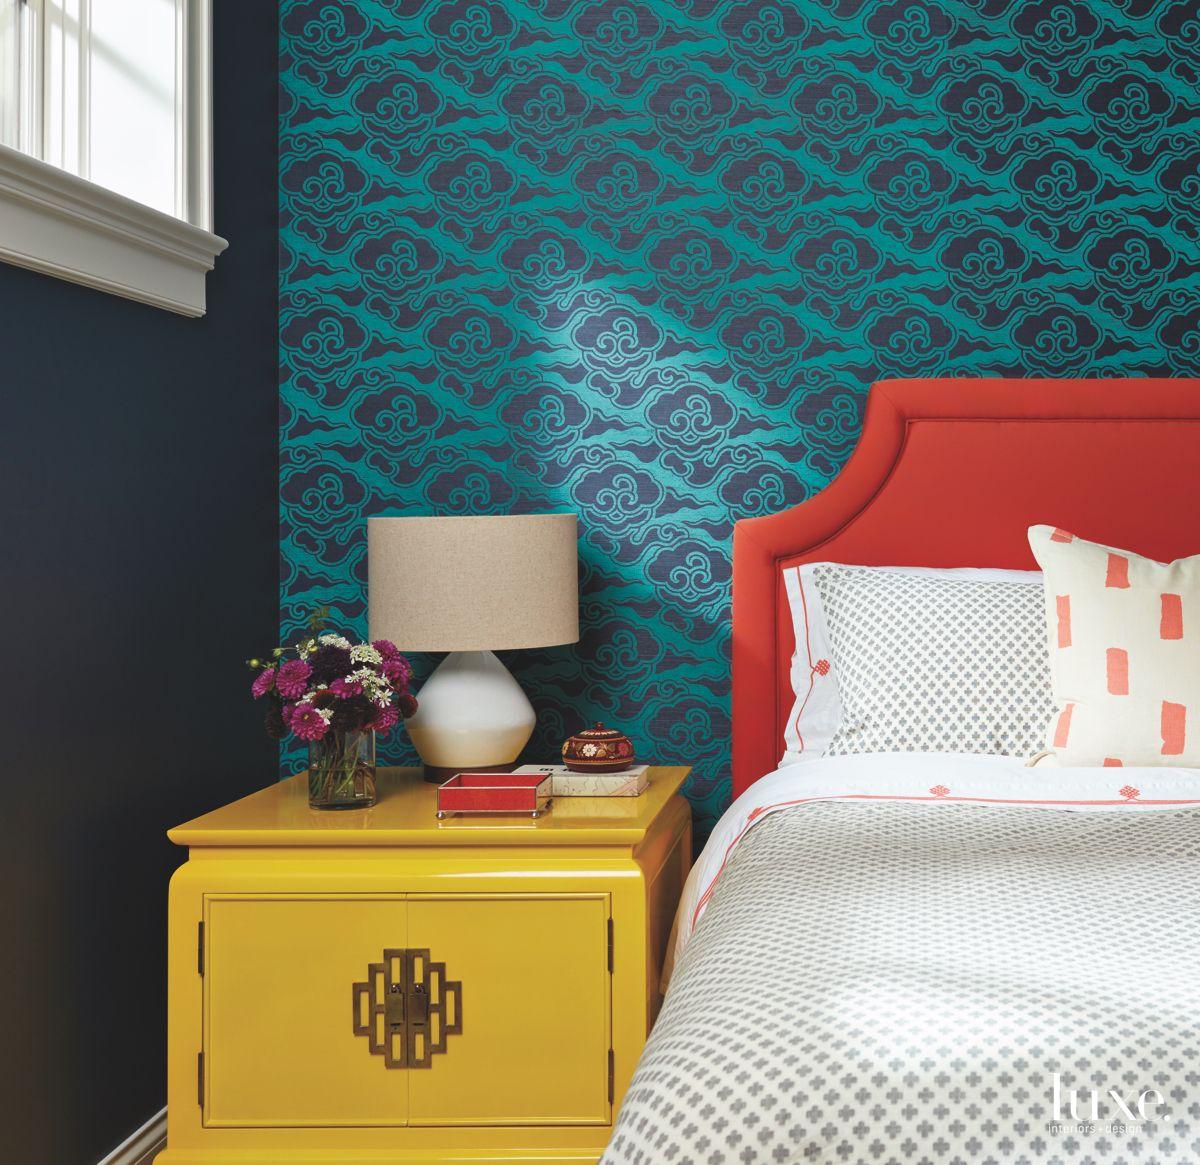 Master Bedroom Jewel Tone Wallpaper Bed and Dresser